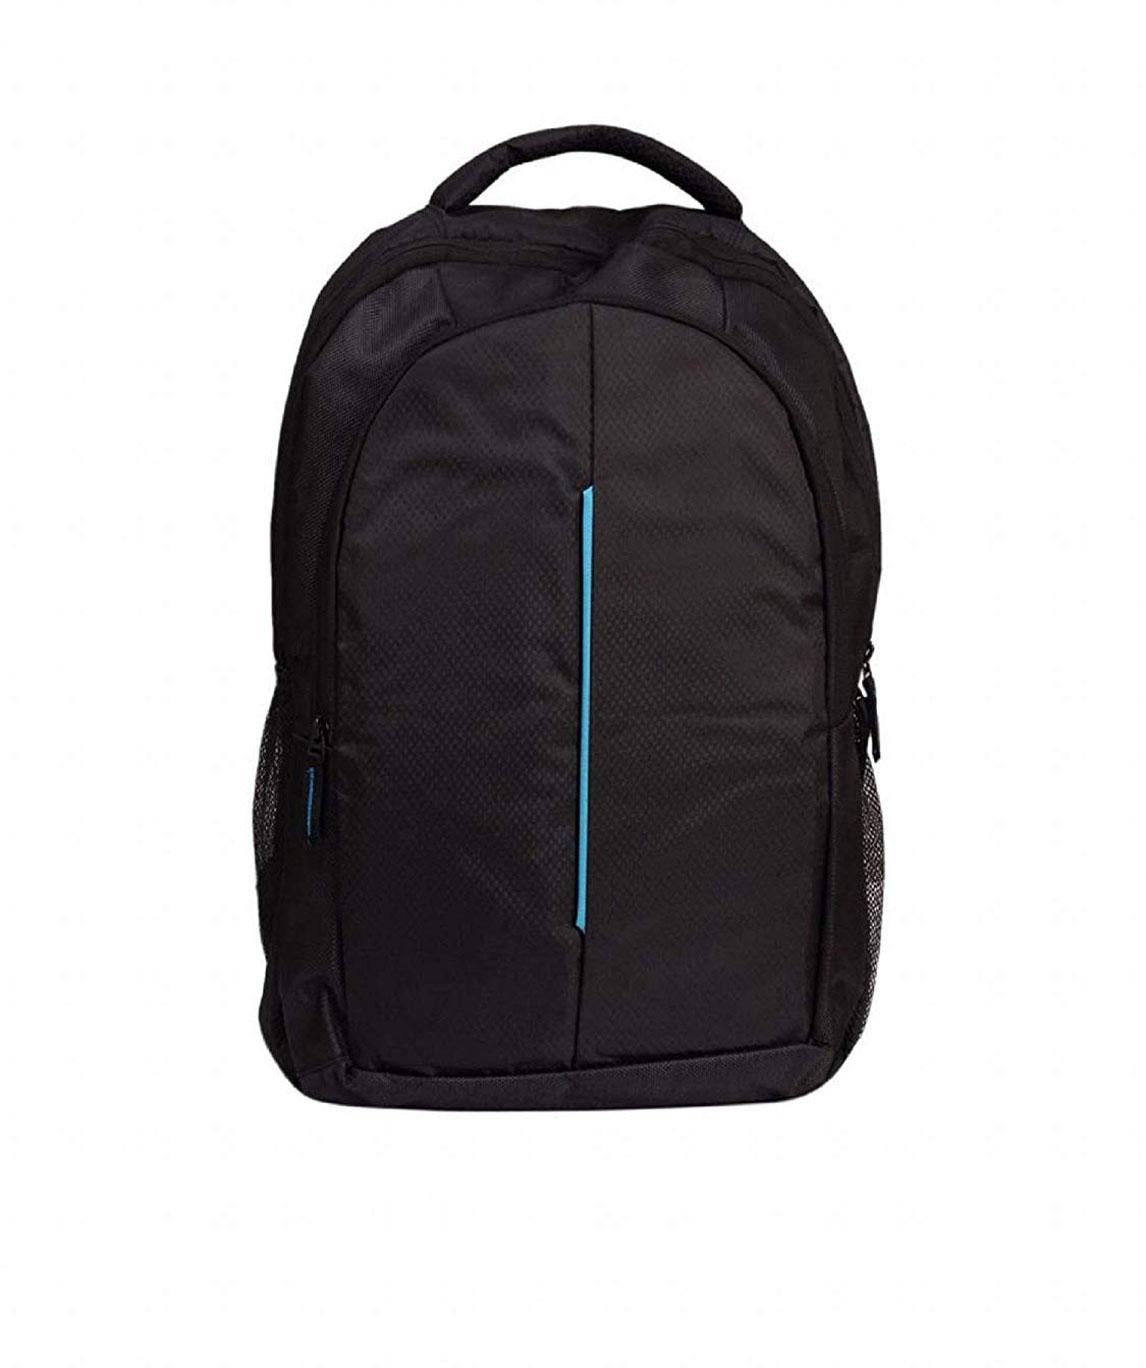 Safar 30 Liters Casual Bagpack/School Bag/Laptop Backpack(Blue::Black_2)